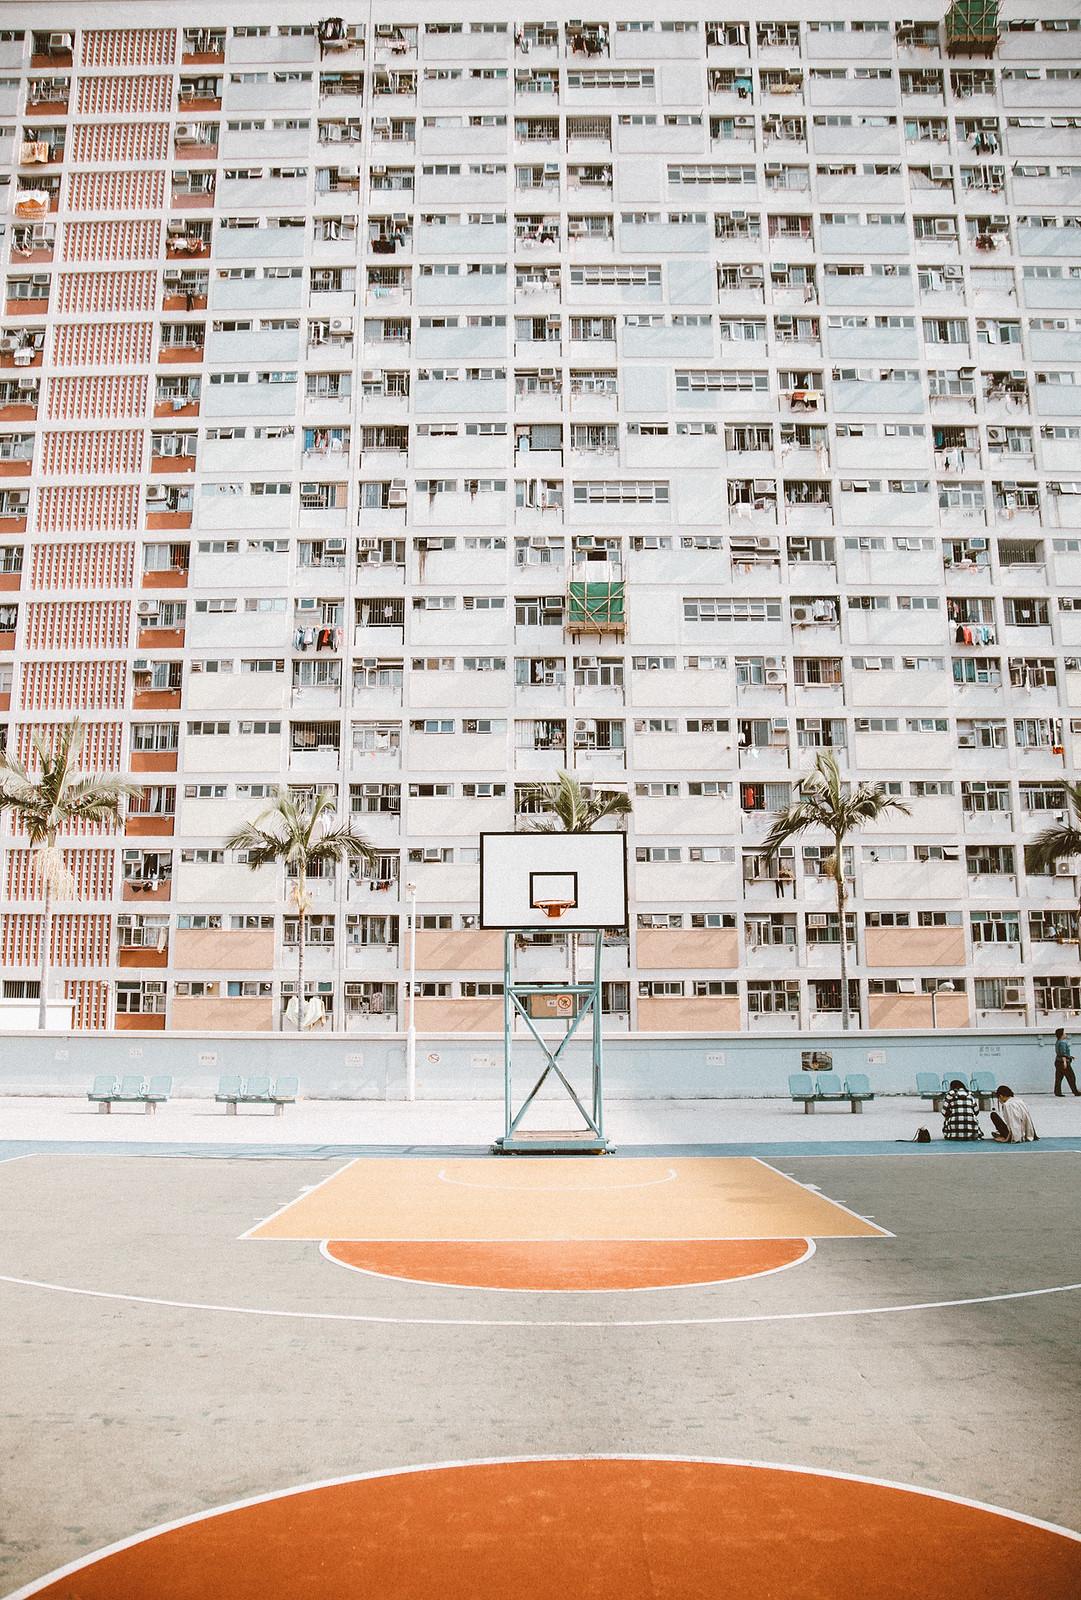 HONG KONG 4-1